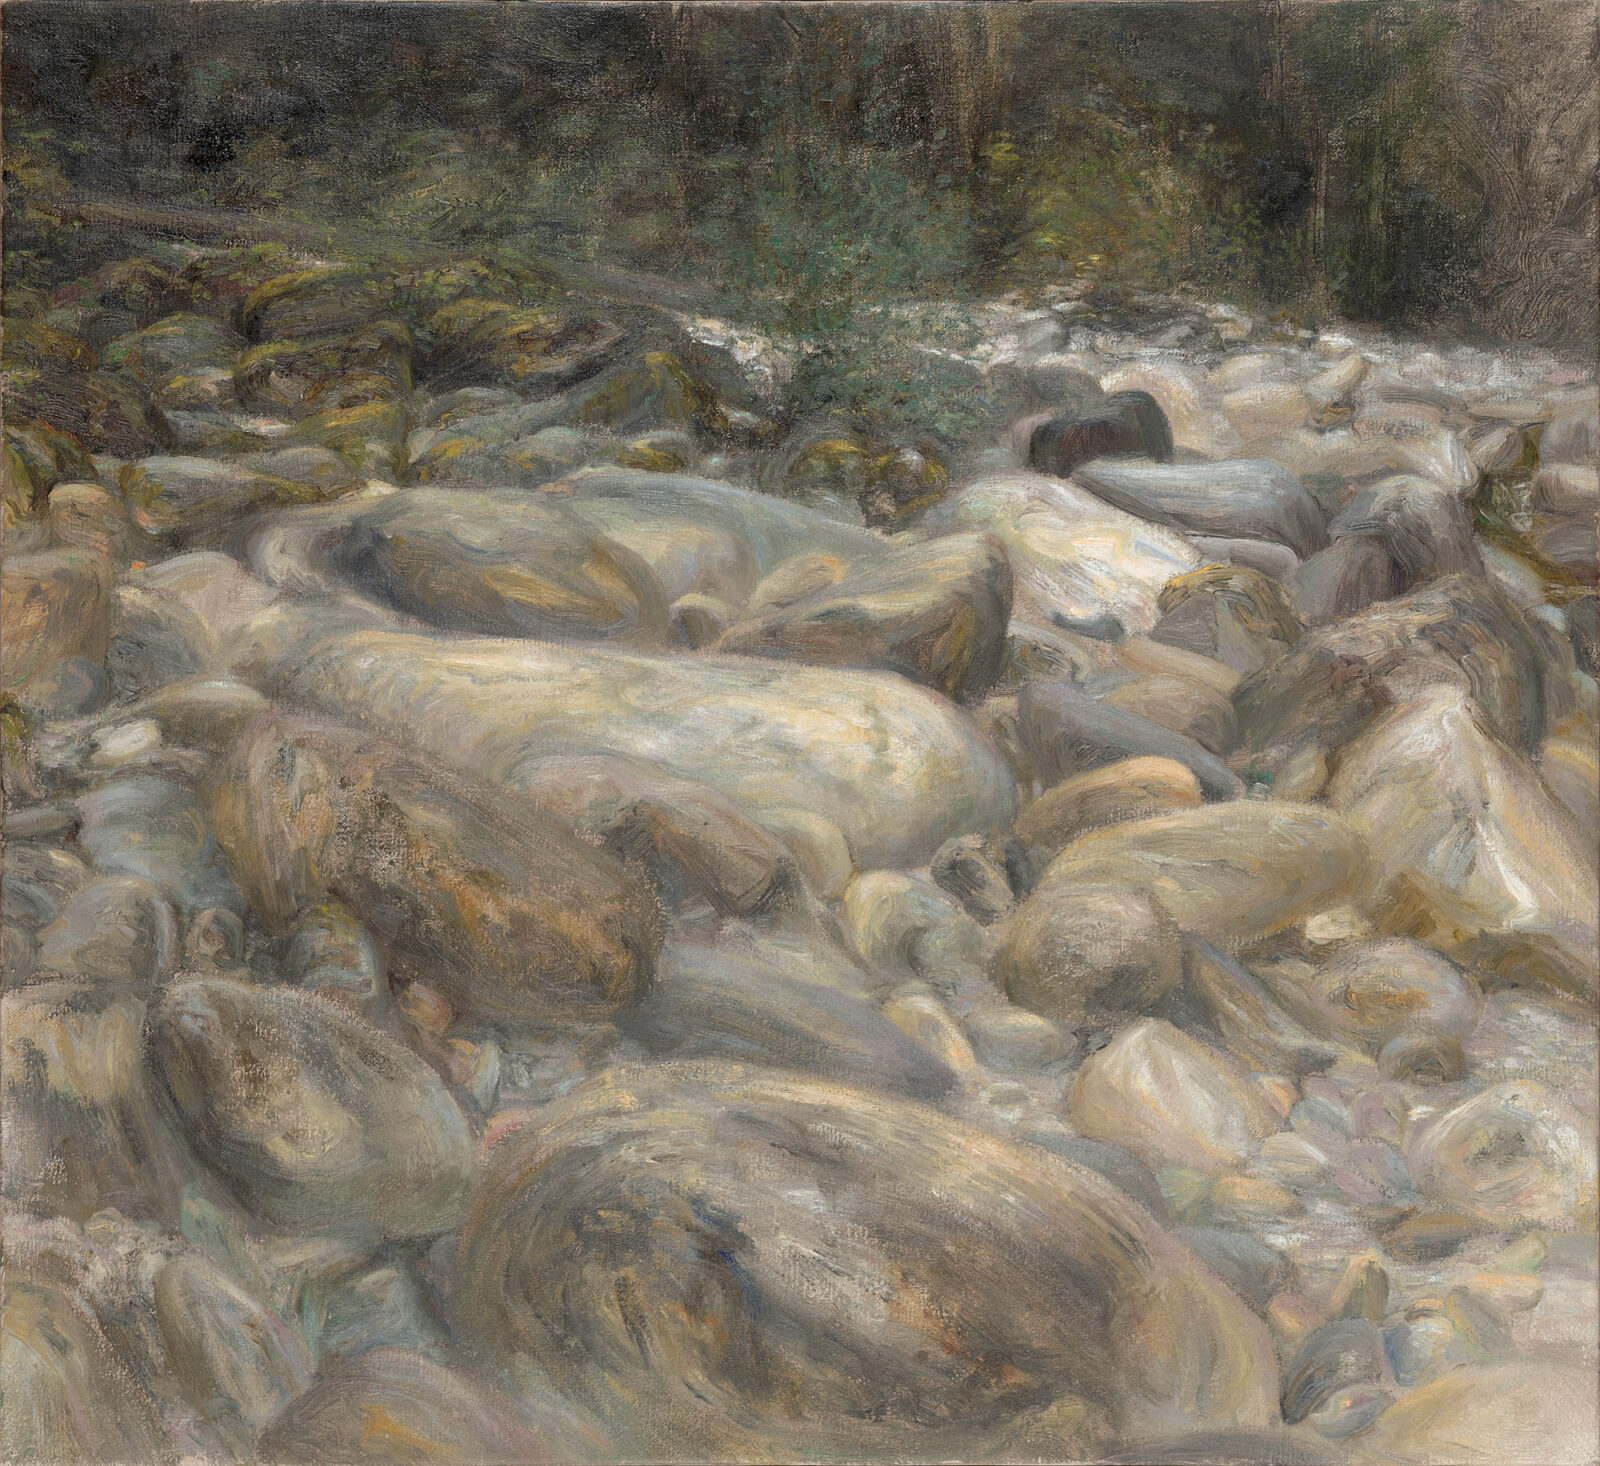 Liza Visagie - Boulders. Oil on Linen 22 x 24 inches